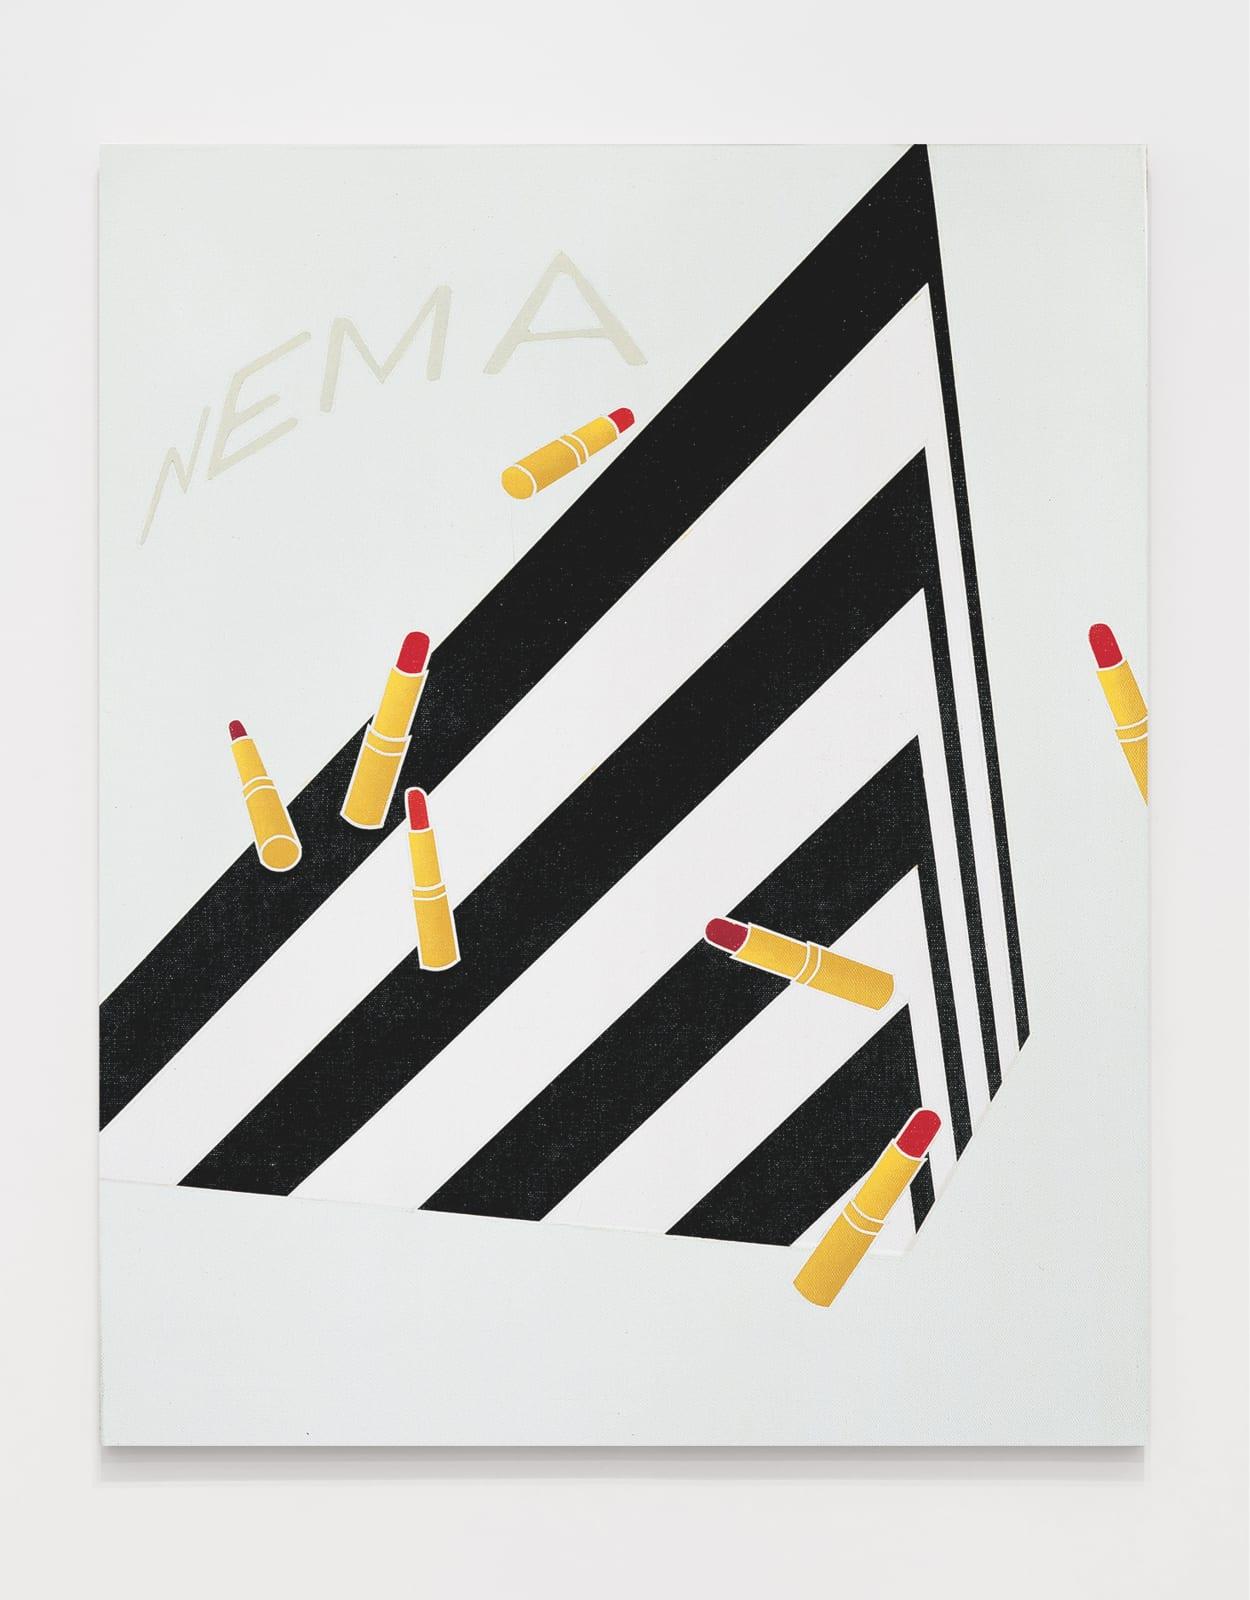 Viaggio in Italia / I Travel to Italy 1972 Acrylic on canvas 39 3/8 x 31 7/8 inches (100 x 81 cm)